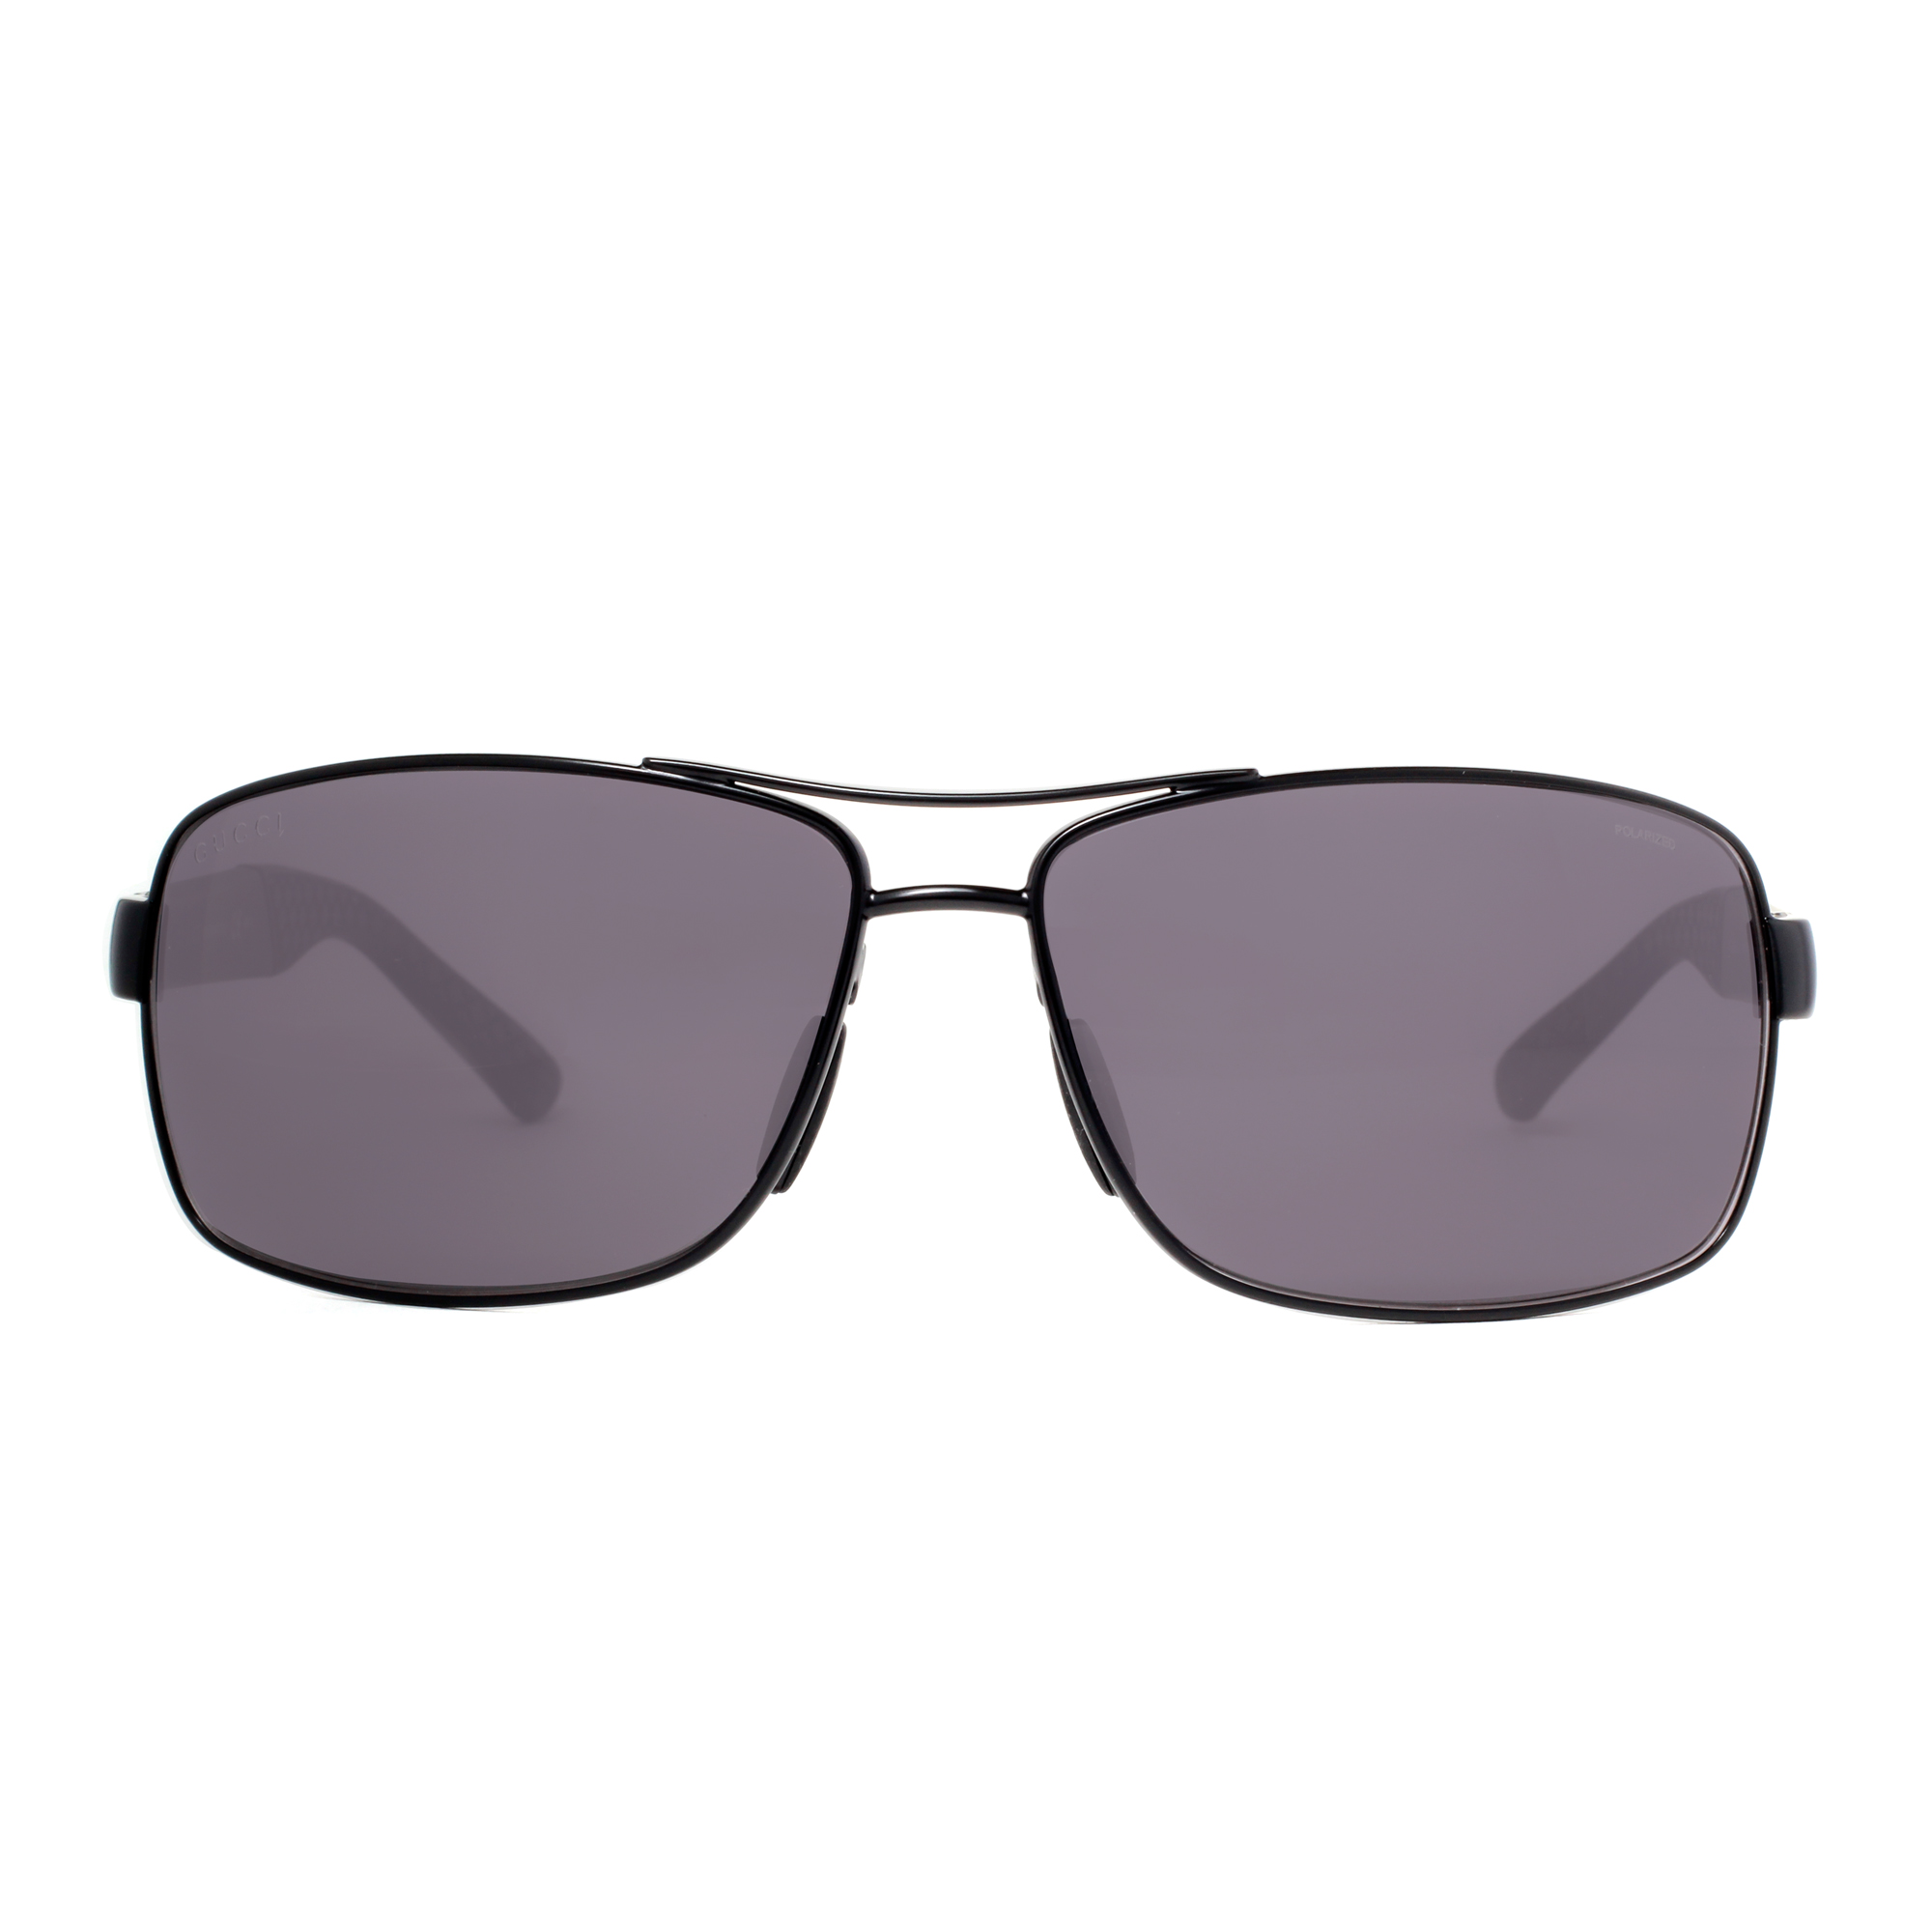 a8067f7fc9700 Gucci - GG 2234 S C0Y 3H Matte Black Grey Polarized Men s Rectangular  Sunglasses - Walmart.com